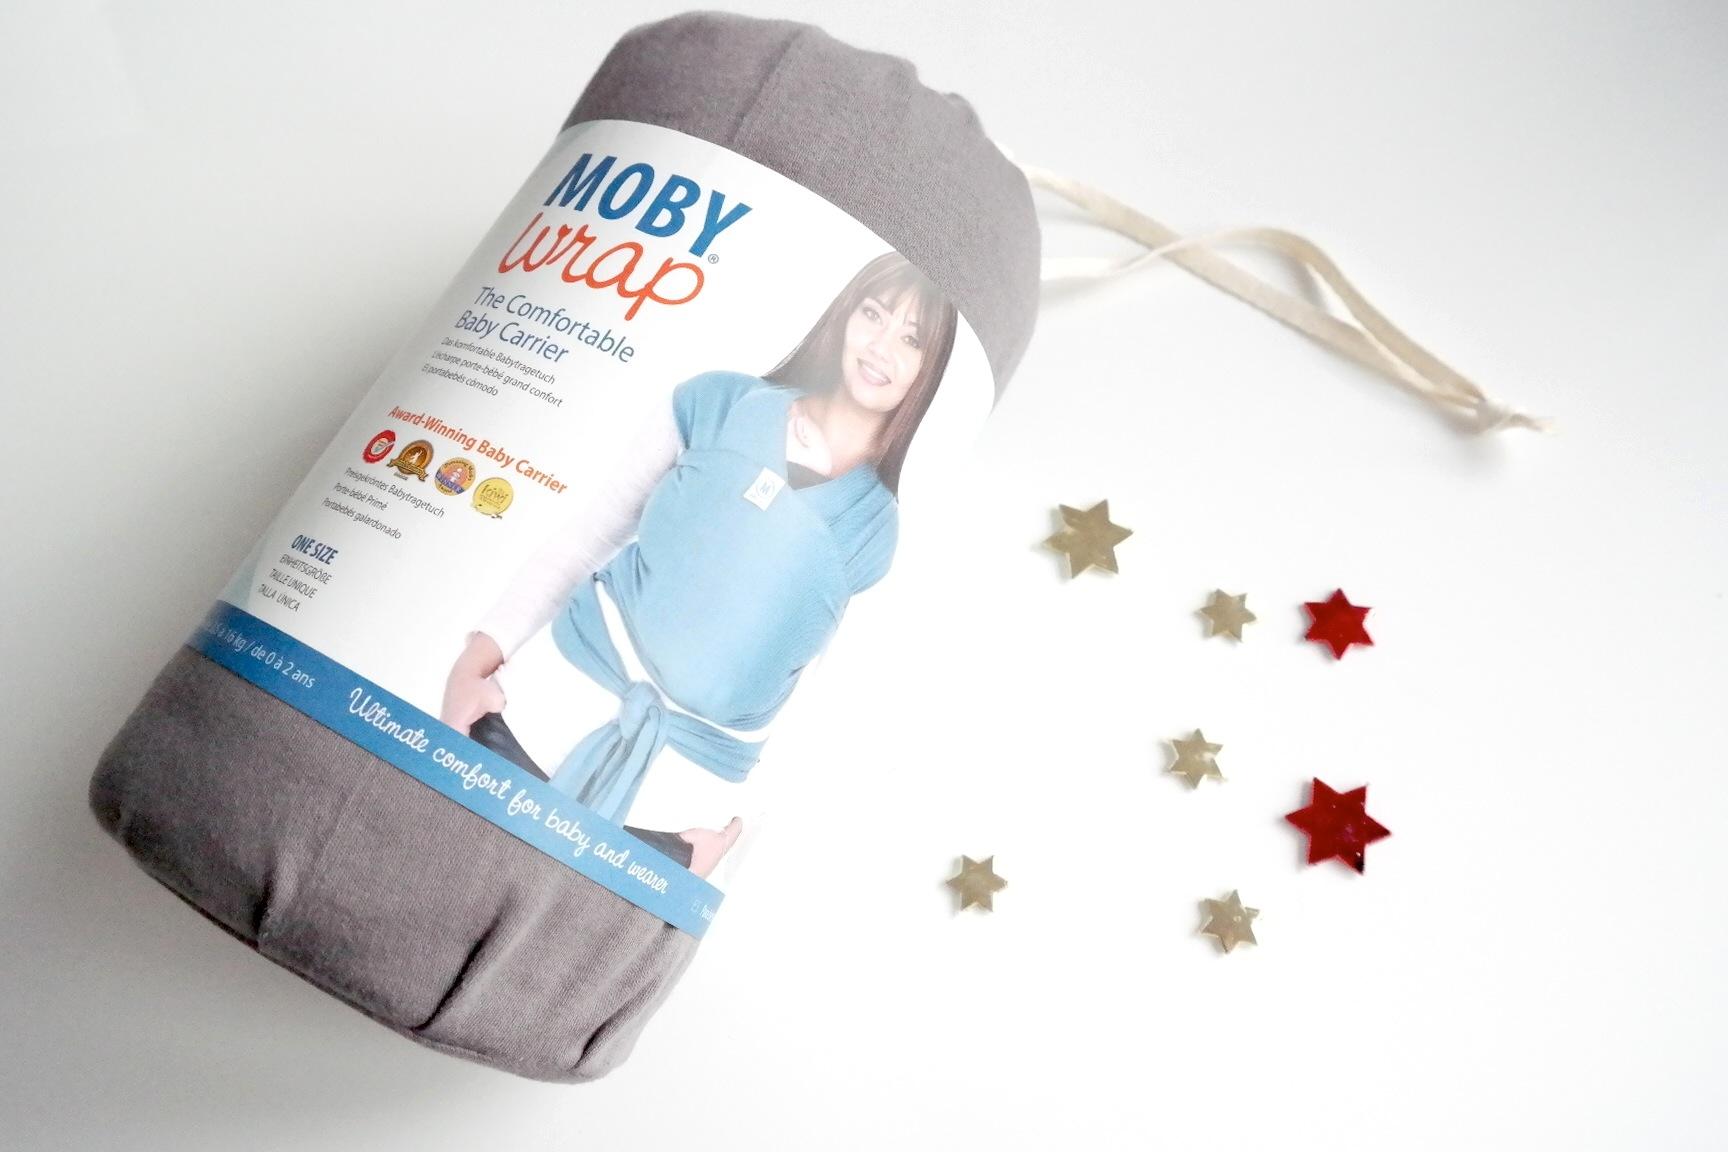 WEihnachtsgeschenke werdende Mutter Schwanger Mama Freundin Moby ...